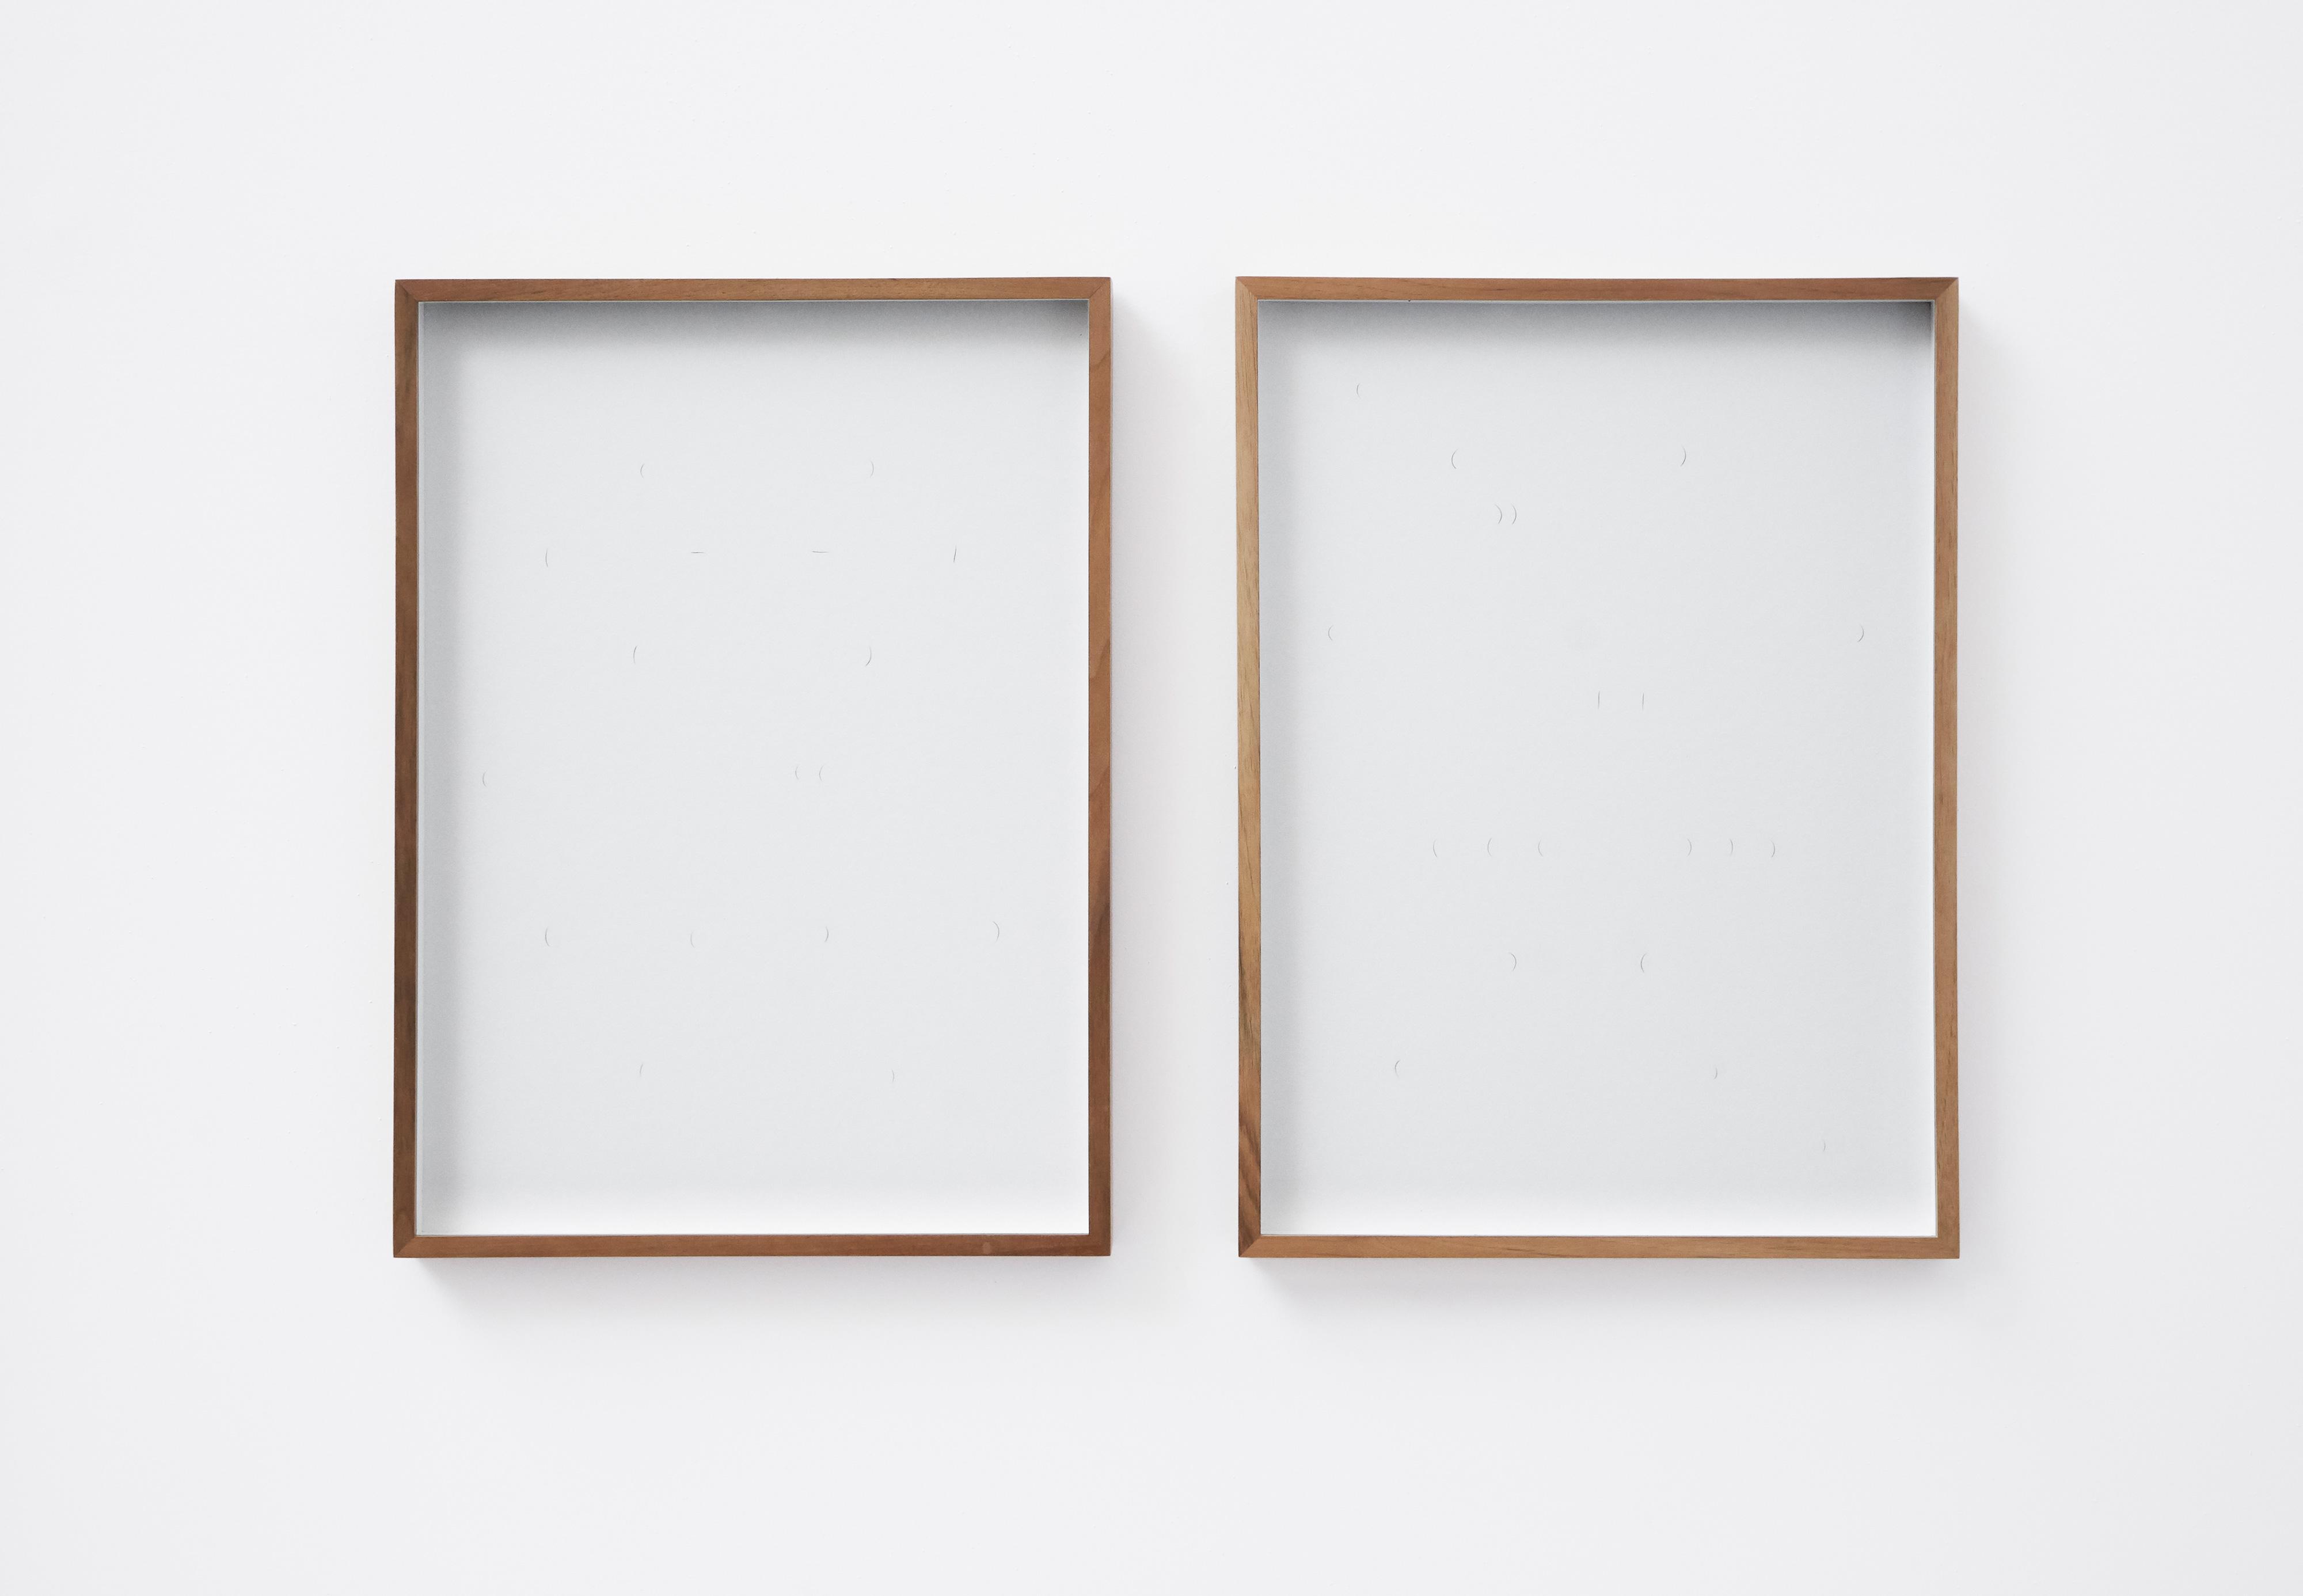 Galerie Barbara Thumm \ New Viewings #7 \ New Viewings #7